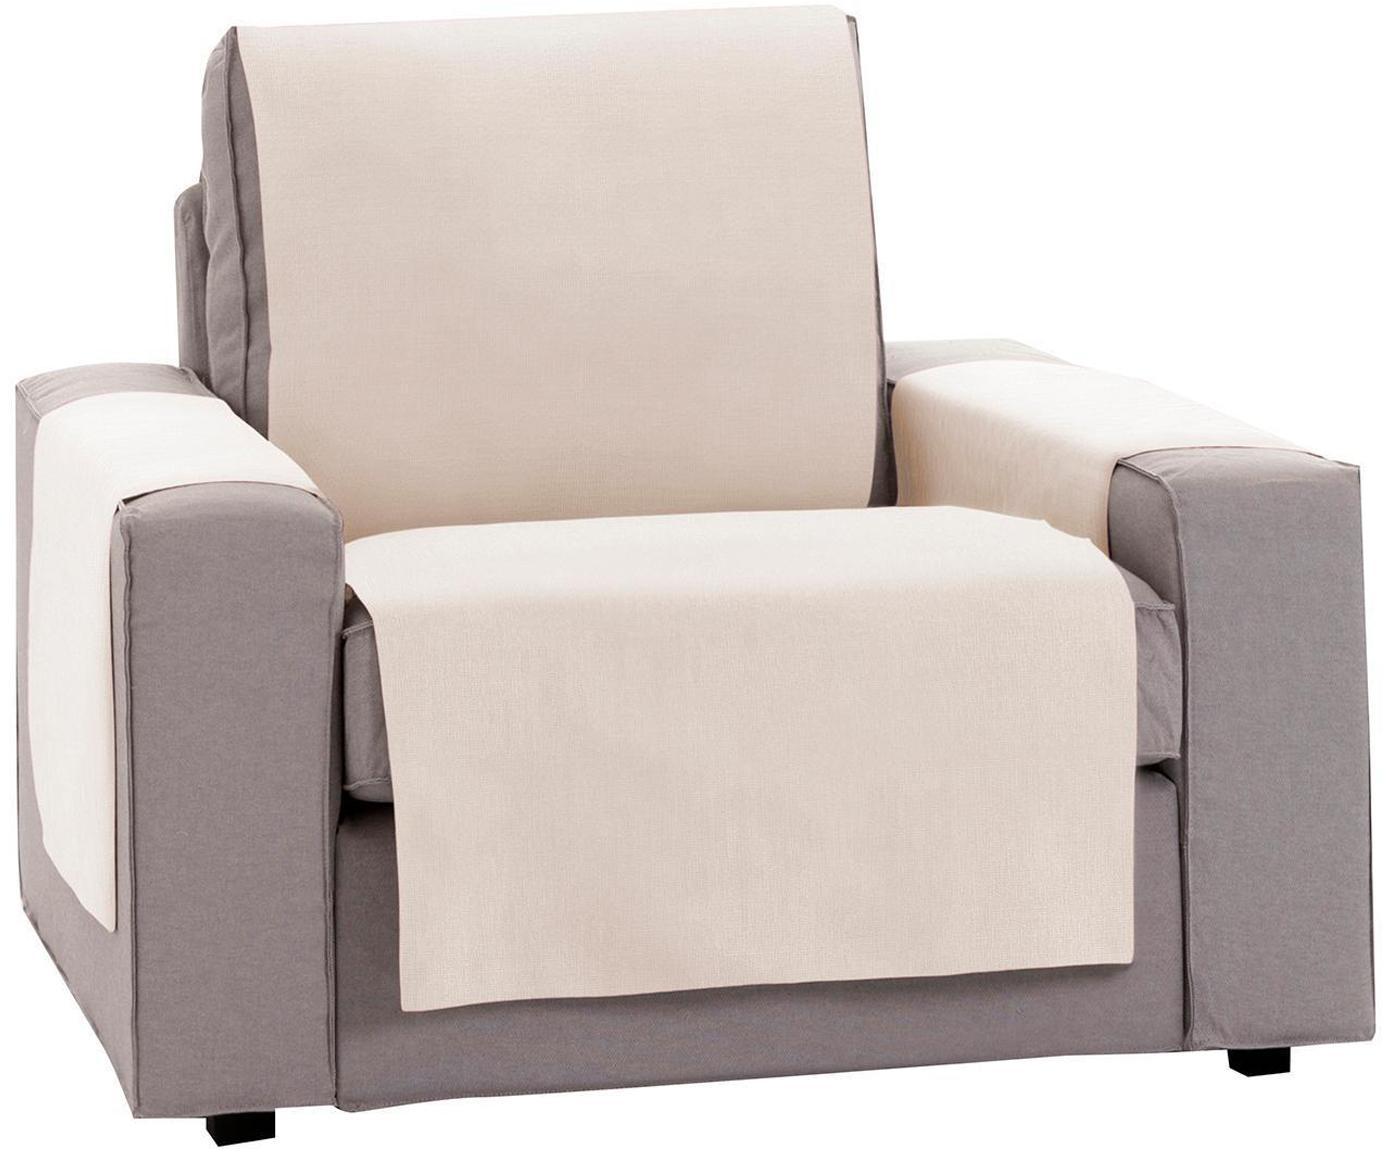 Funda de sillón Levante, 50%algodón, 50%poliéster, Beige, An 55 x L 220 cm